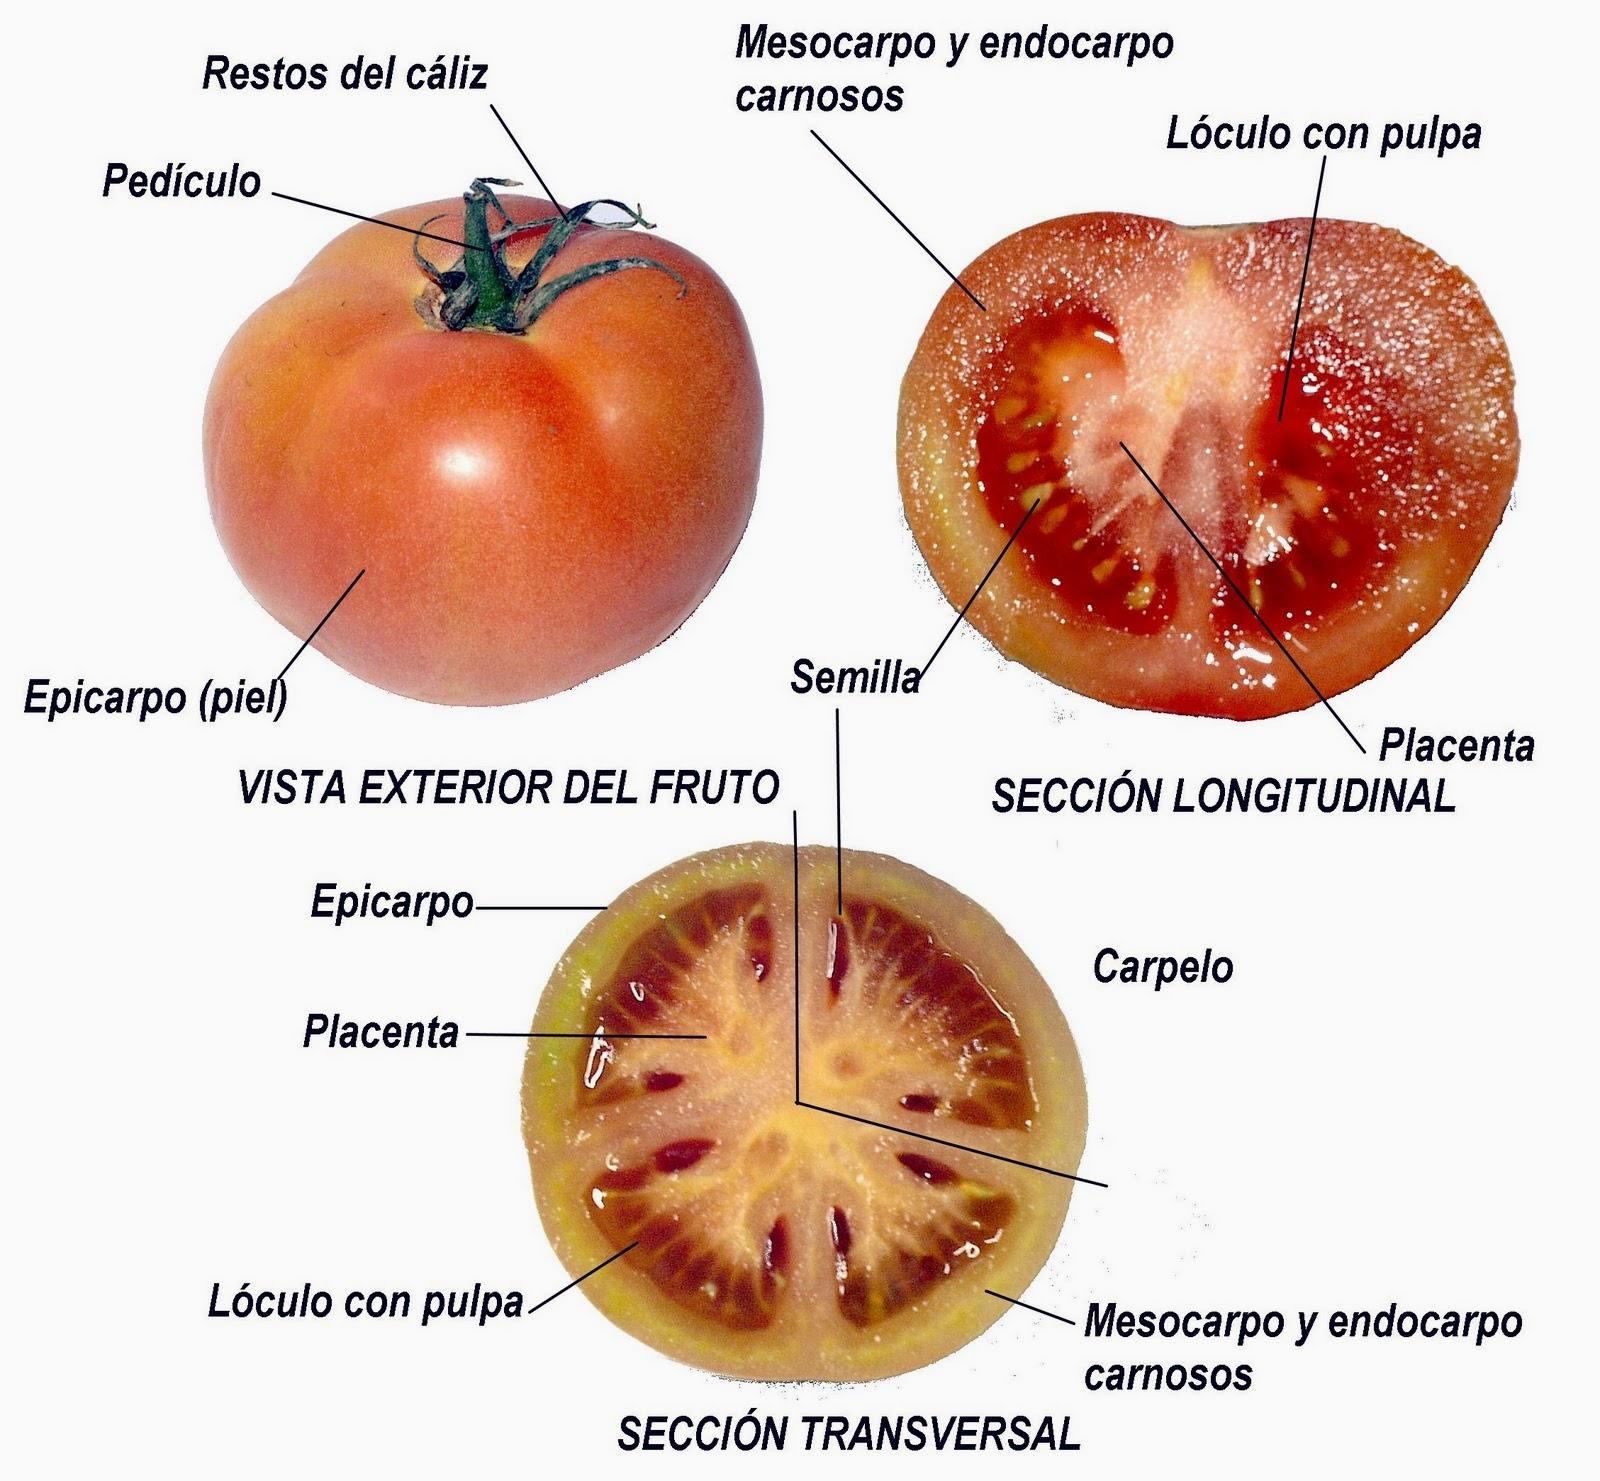 Cultivando Tomates Caracteristicas Botánicas Del Tomate